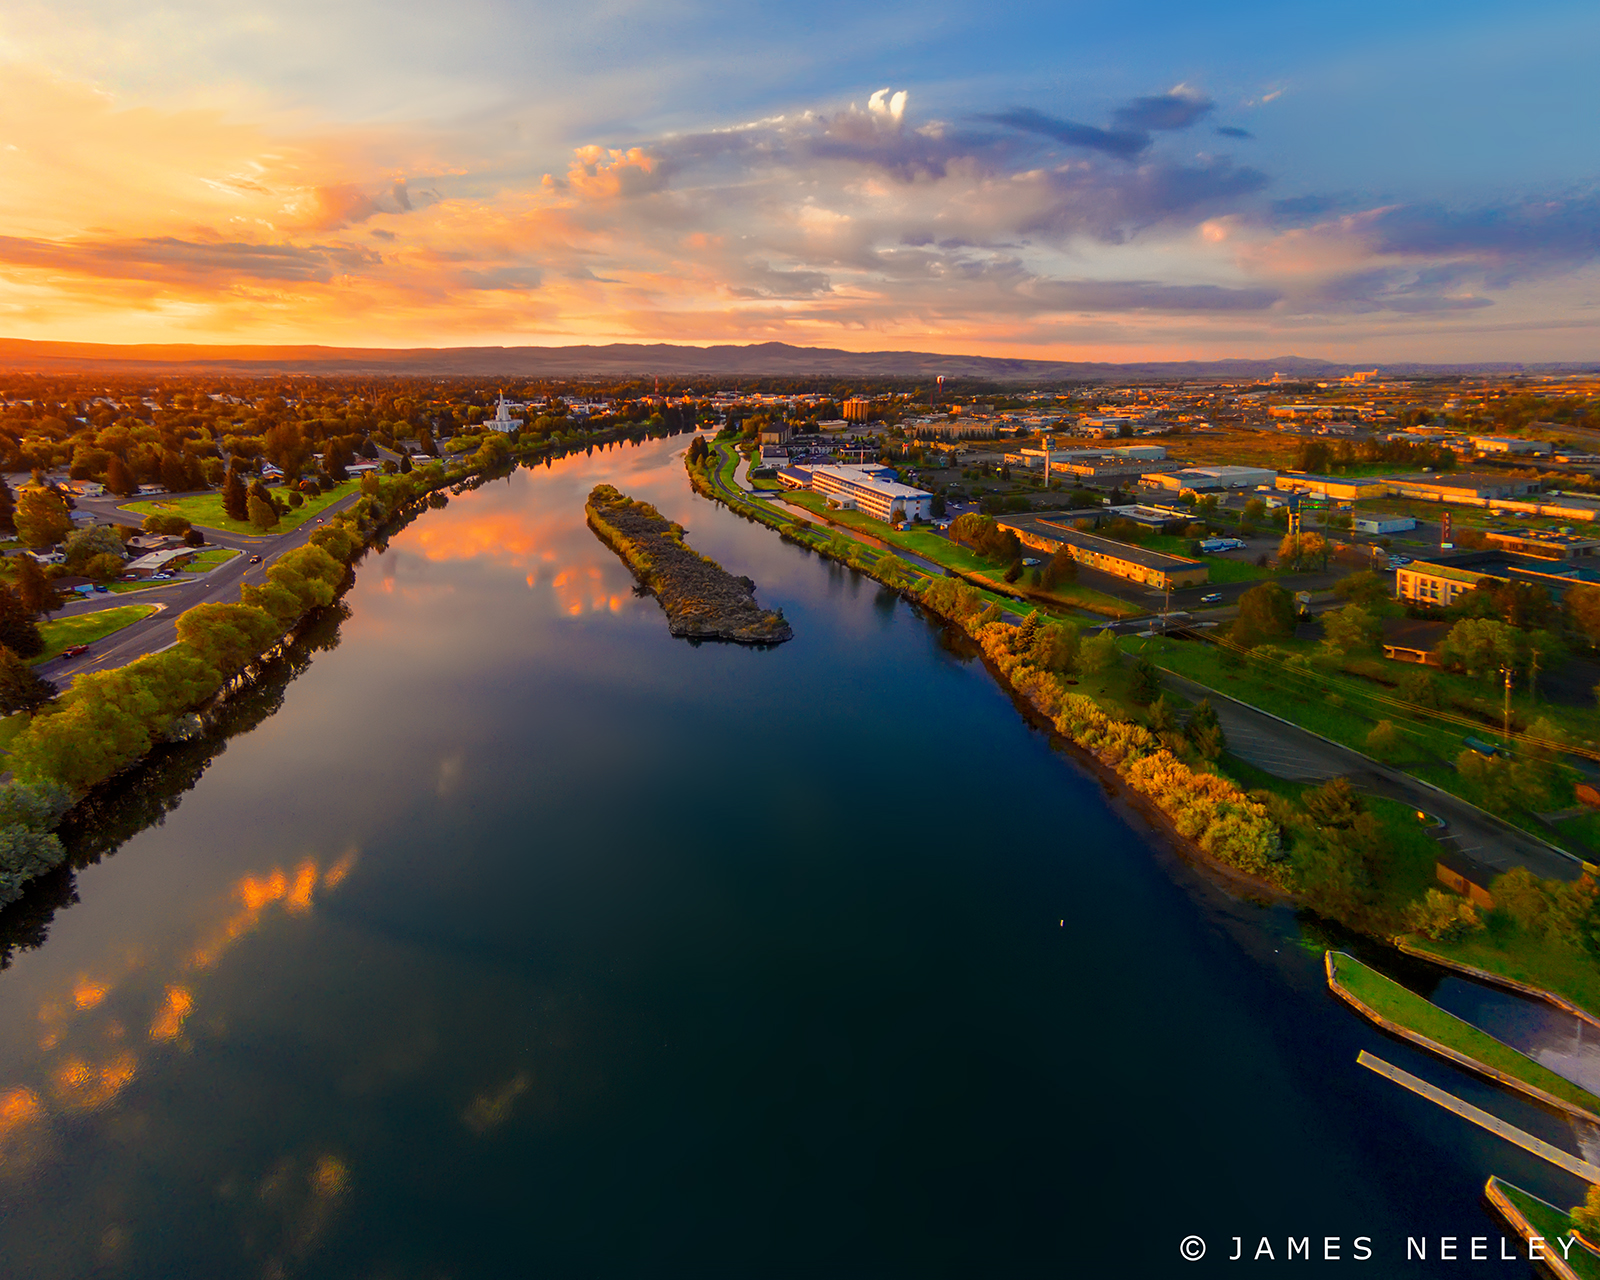 sunrise snakeriver aerialphotography idahofalls jamesneeley quadcopter djiphantom2vision